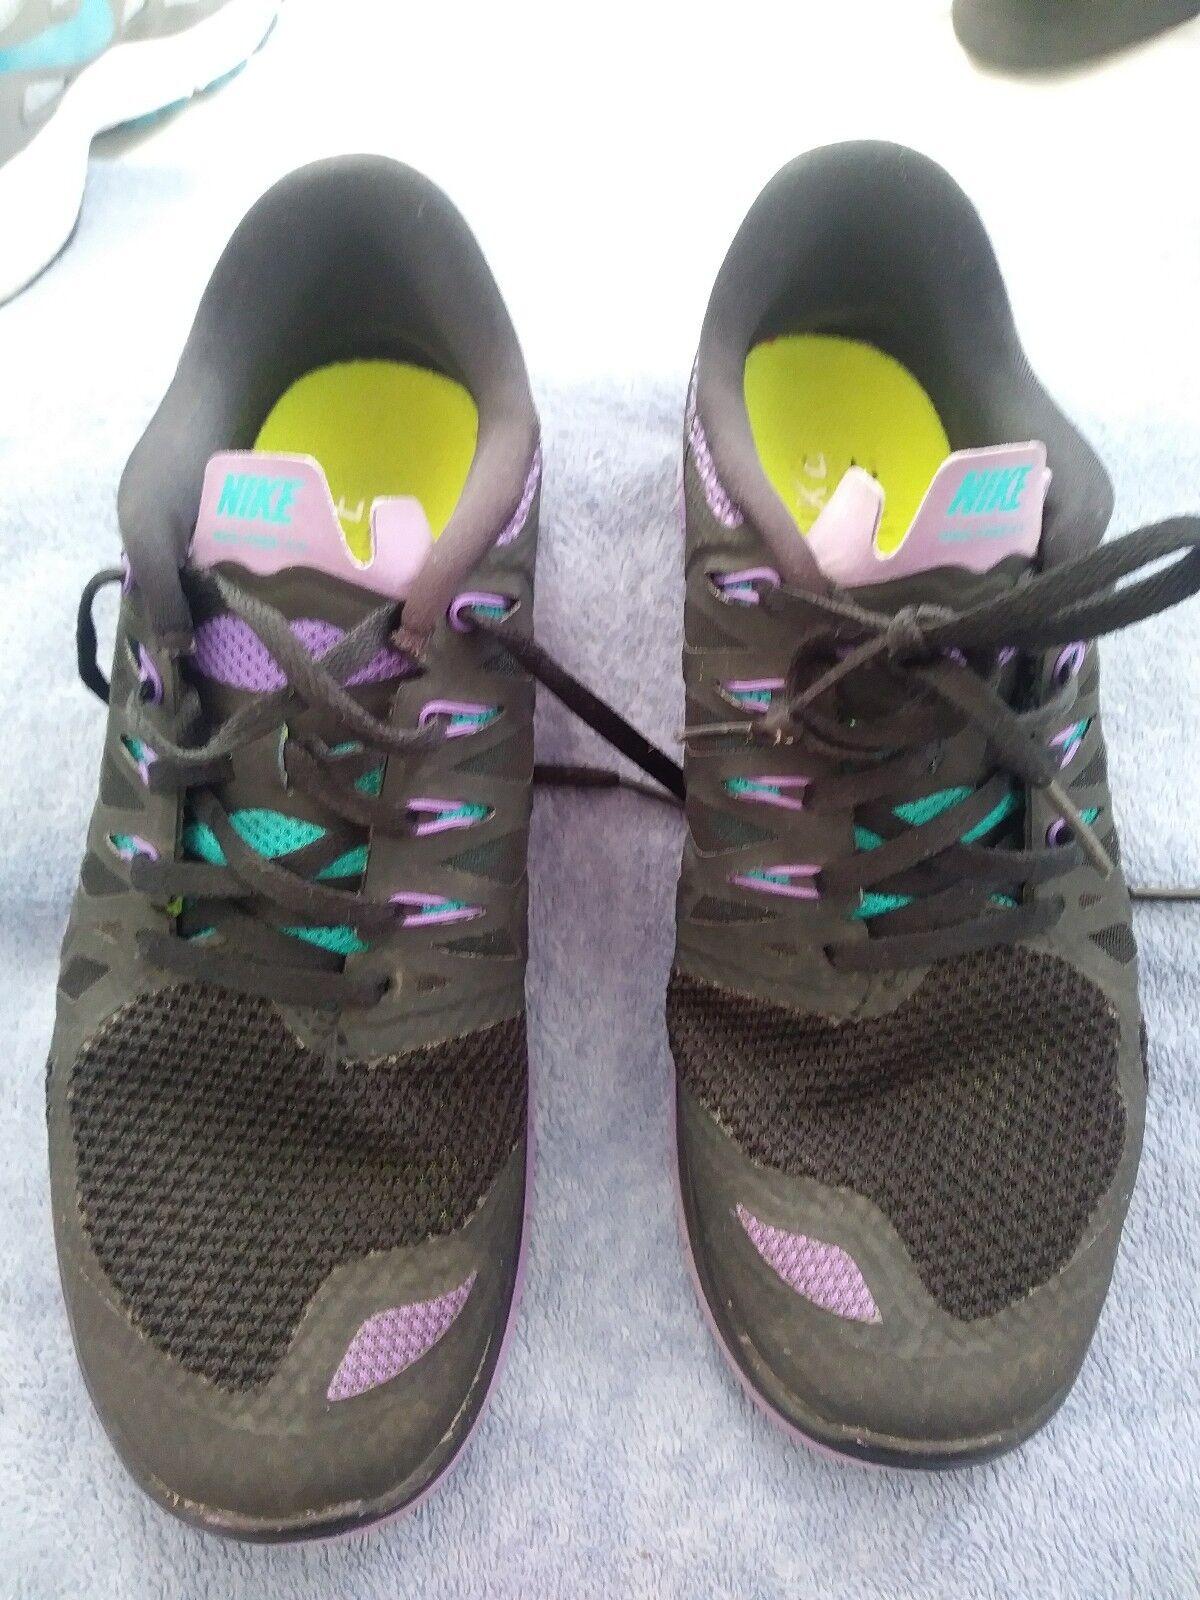 047a71da1a7f nike free 5.0 womens 9.5 9.5 9.5 c4478c - outdoor.cynfuleats.com